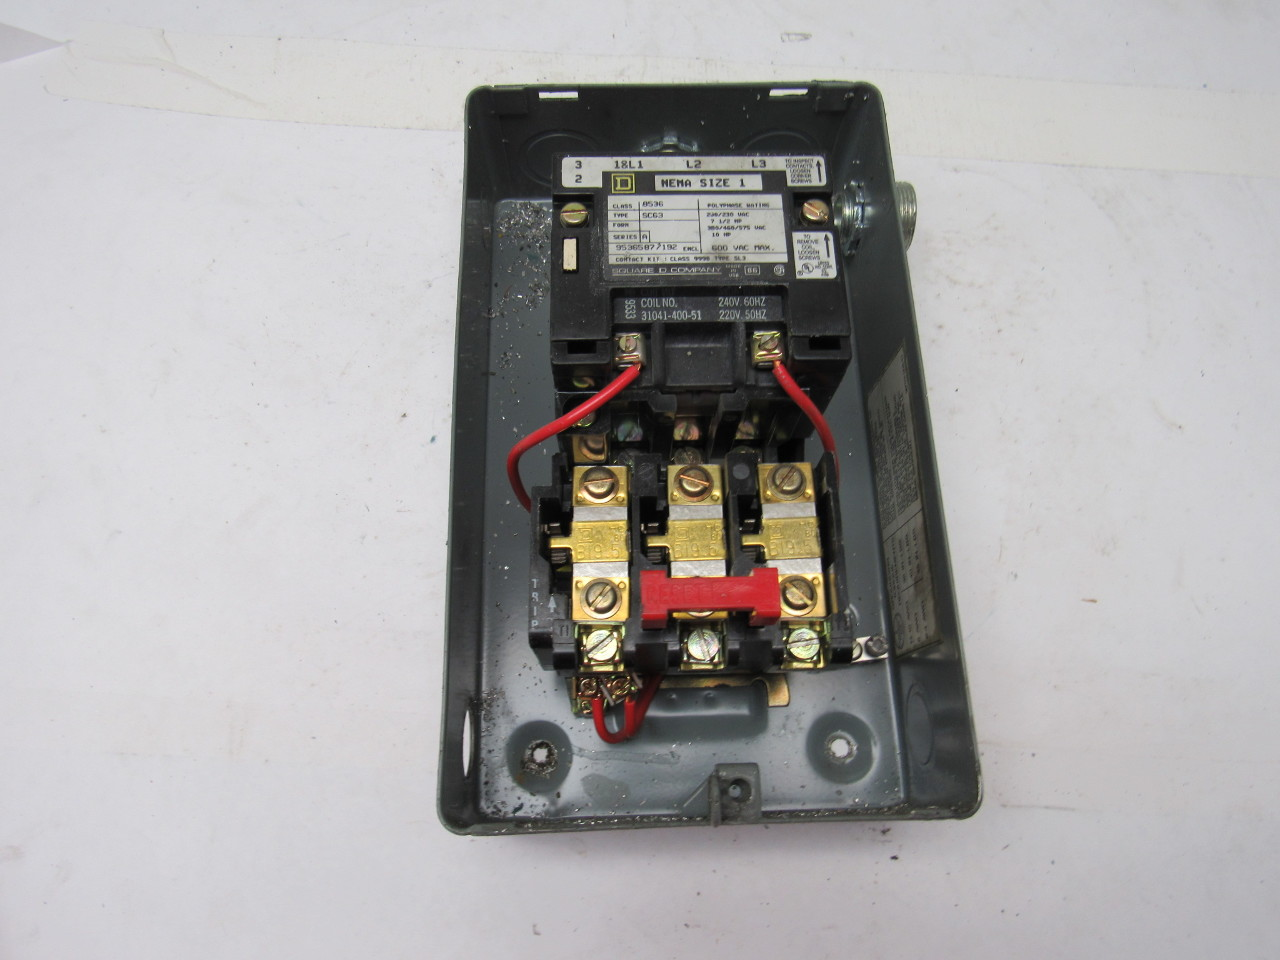 Square D 8536scg3 Motor Starter 240v Nema Size 1 W 30072